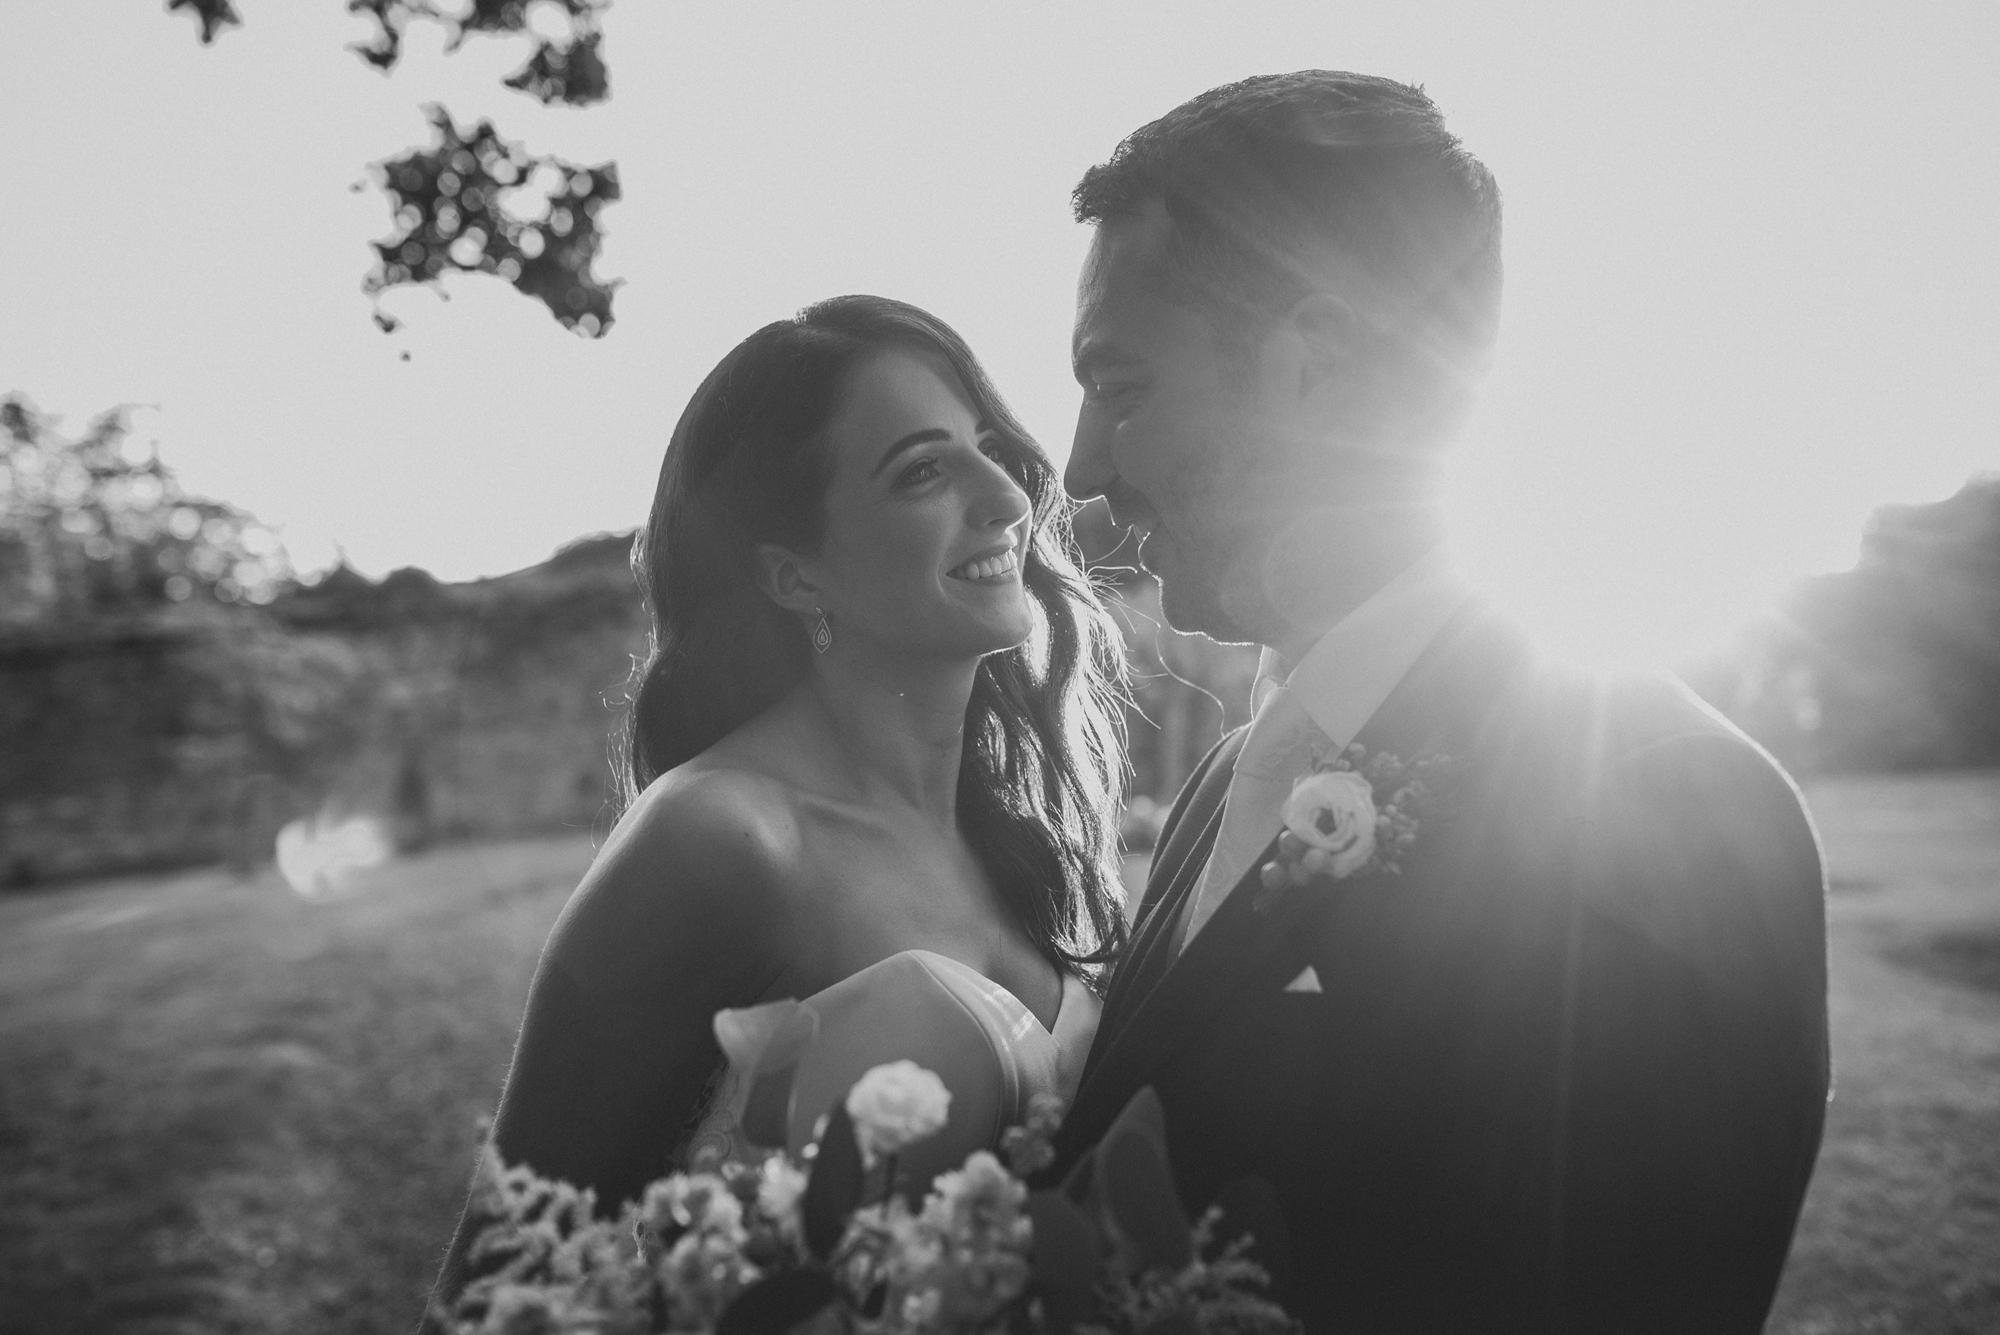 mark_barton_Wedding_photographer_northern_ireland_14.jpg